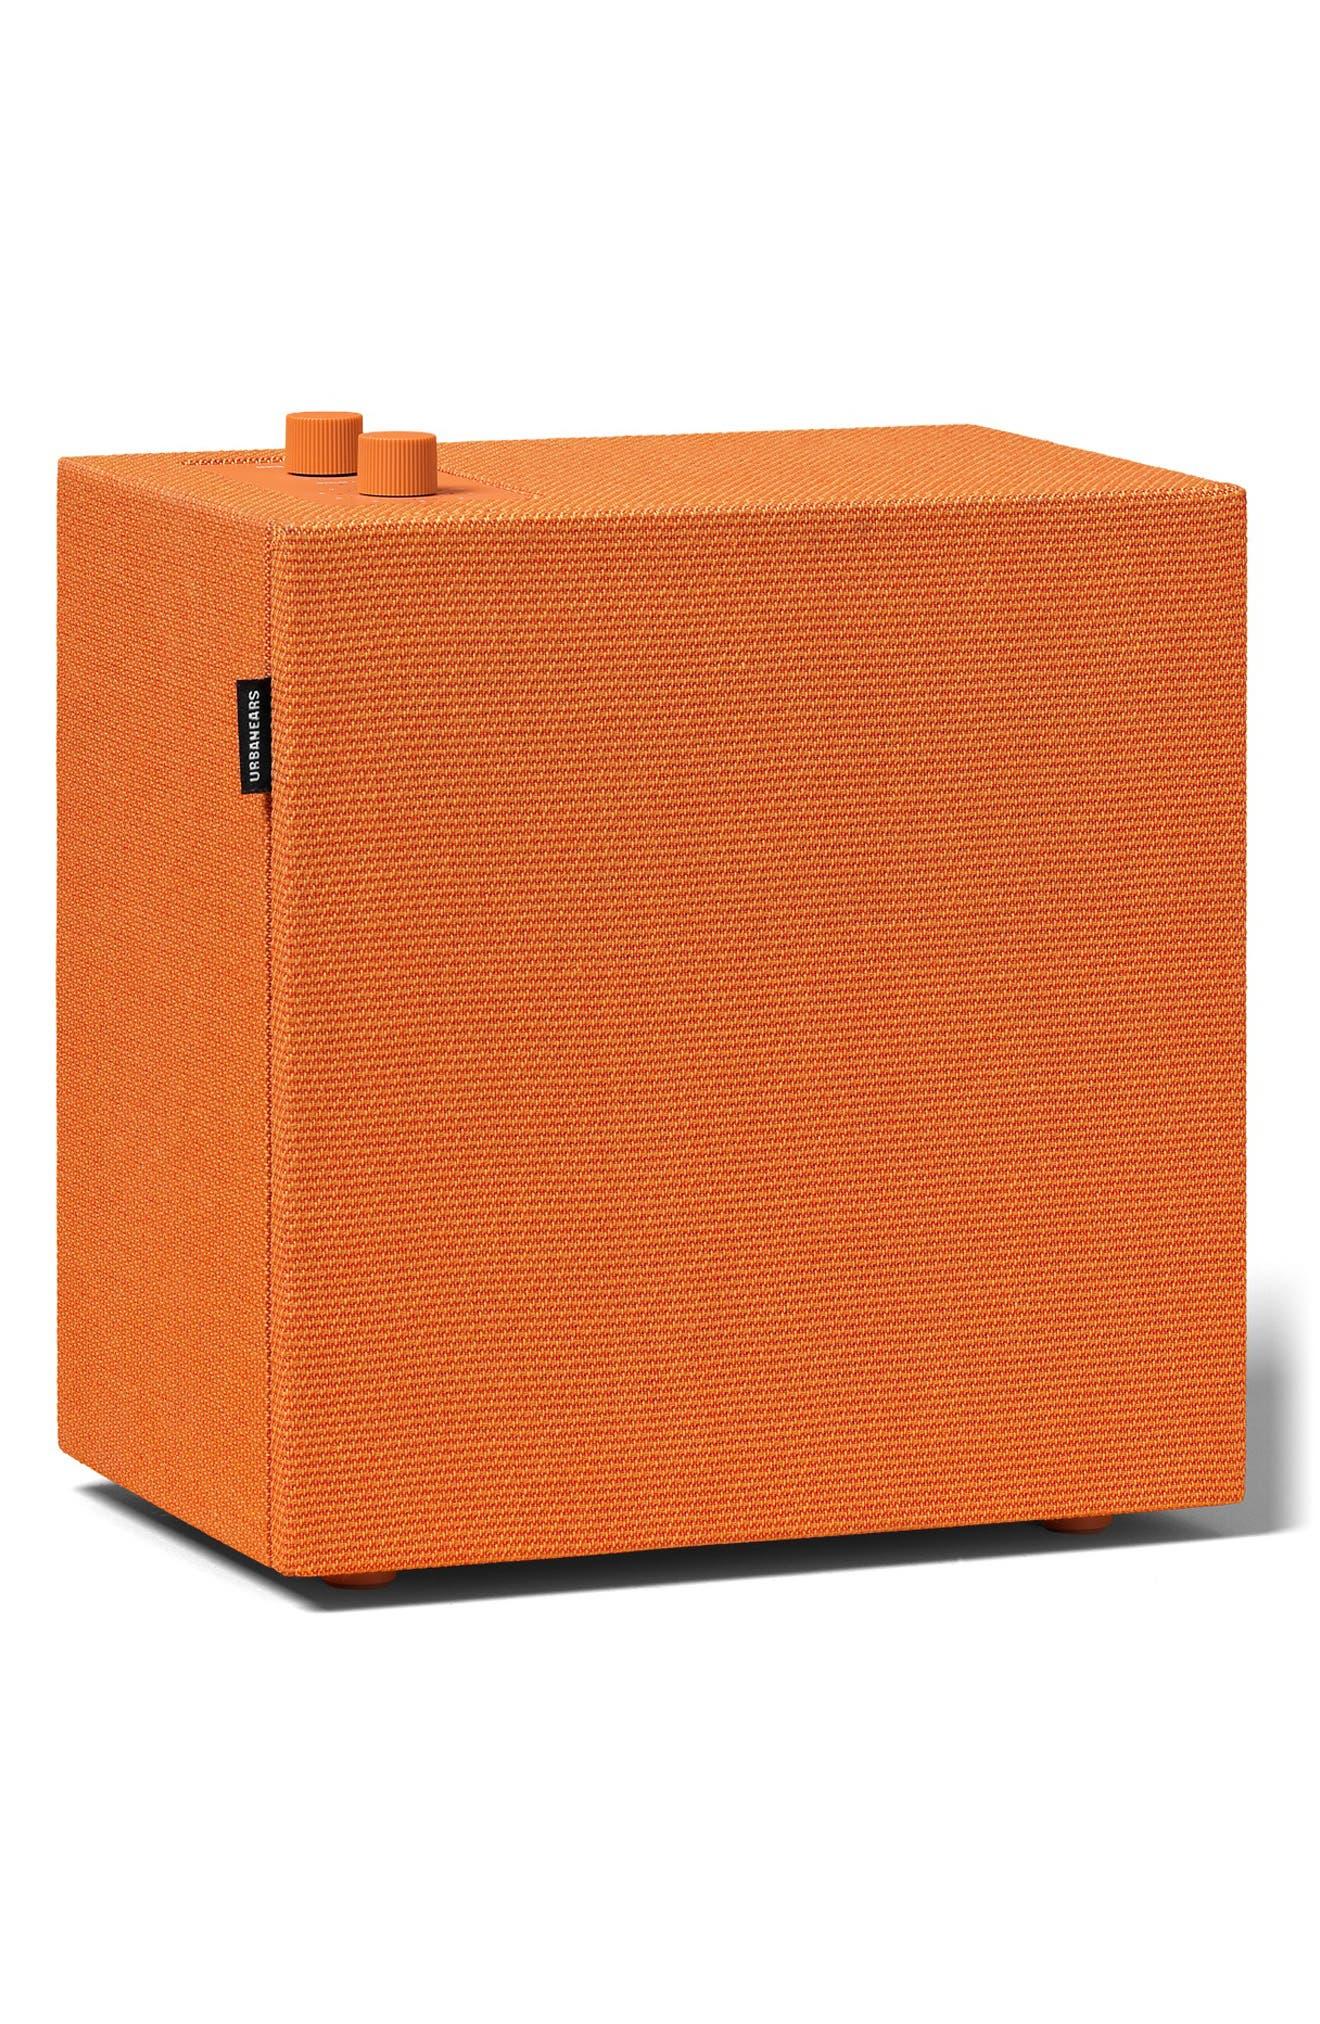 Stammen Bluetooth<sup>®</sup> Speaker,                             Alternate thumbnail 2, color,                             GOLDFISH ORANGE